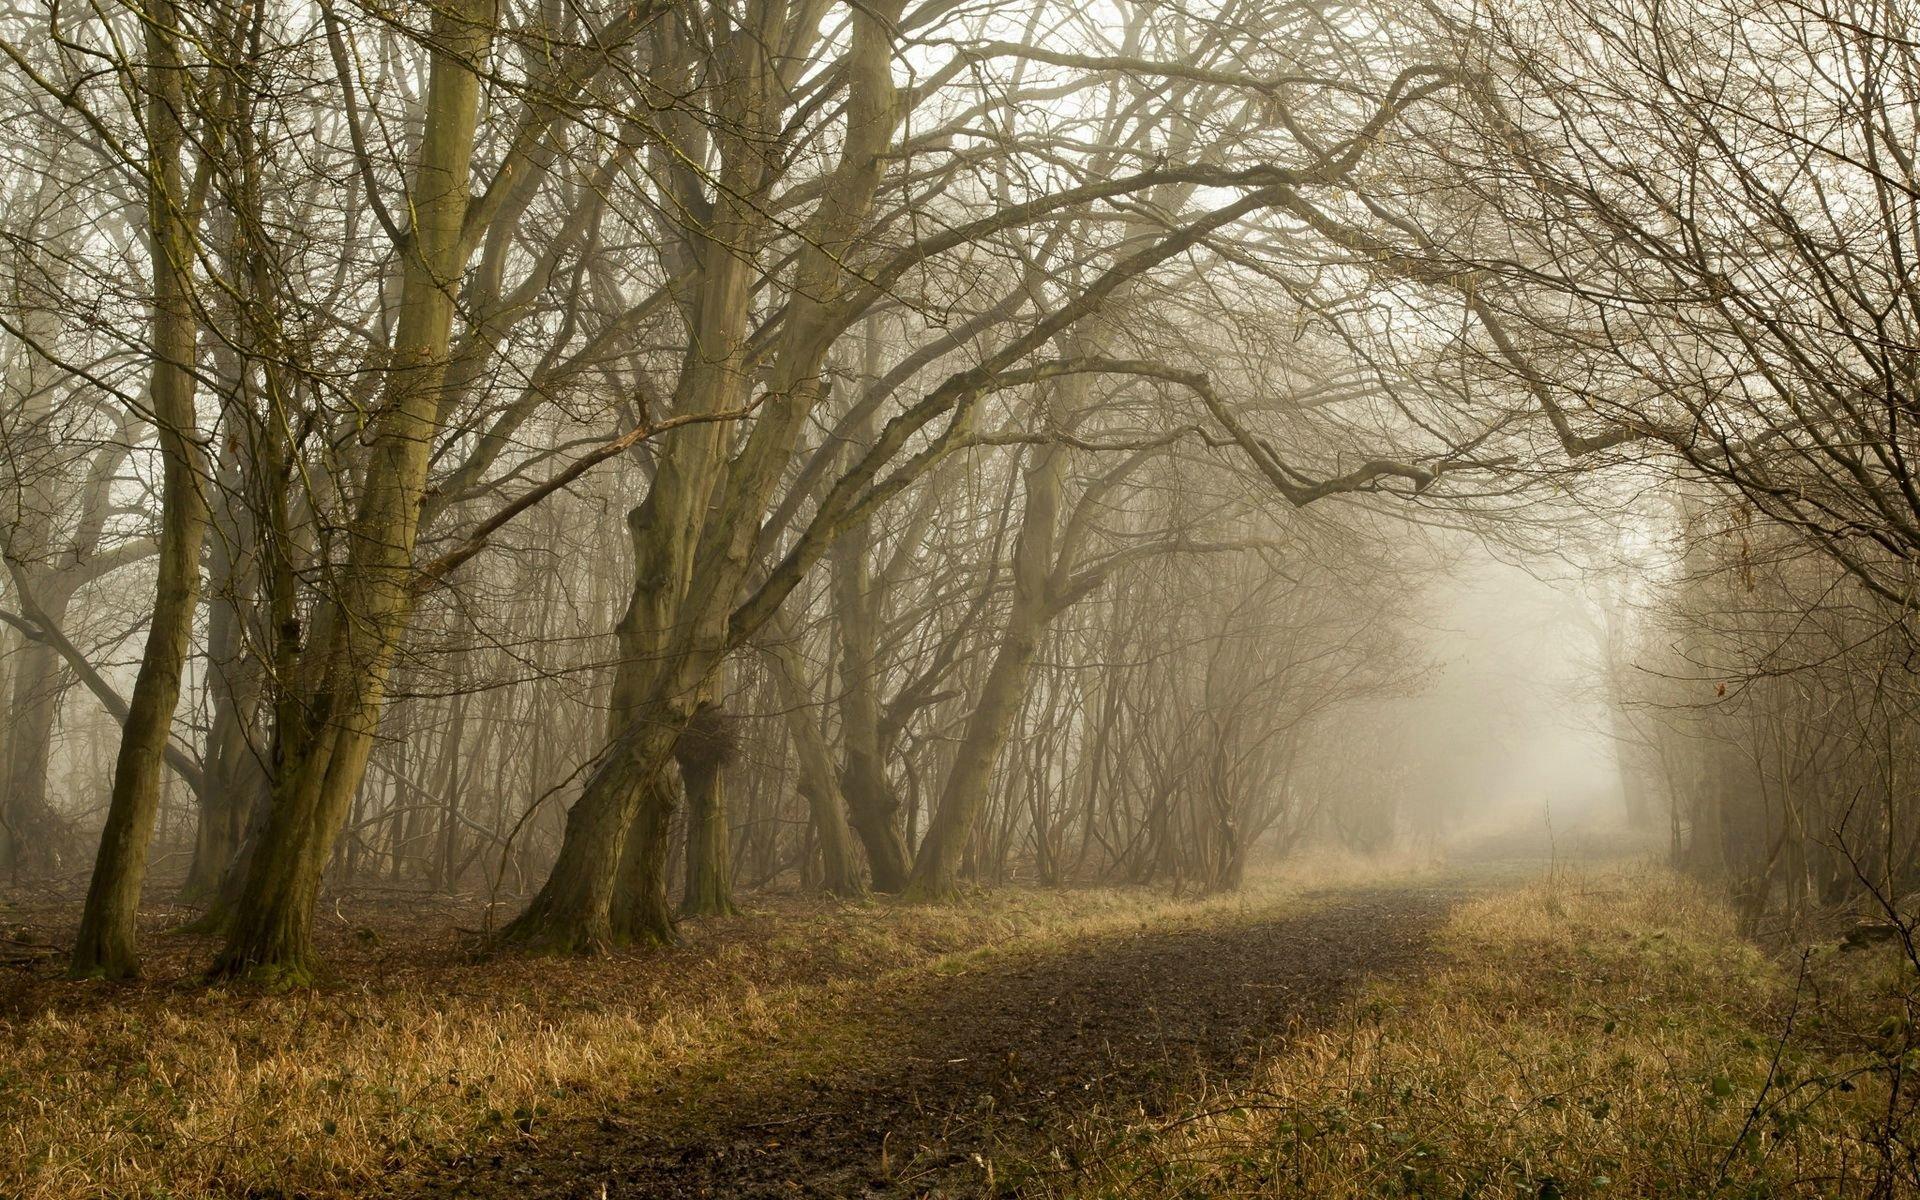 Fall Wallpaper Hd For Galaxy S4 Beautiful Forest 16302 Hd Wallpaper